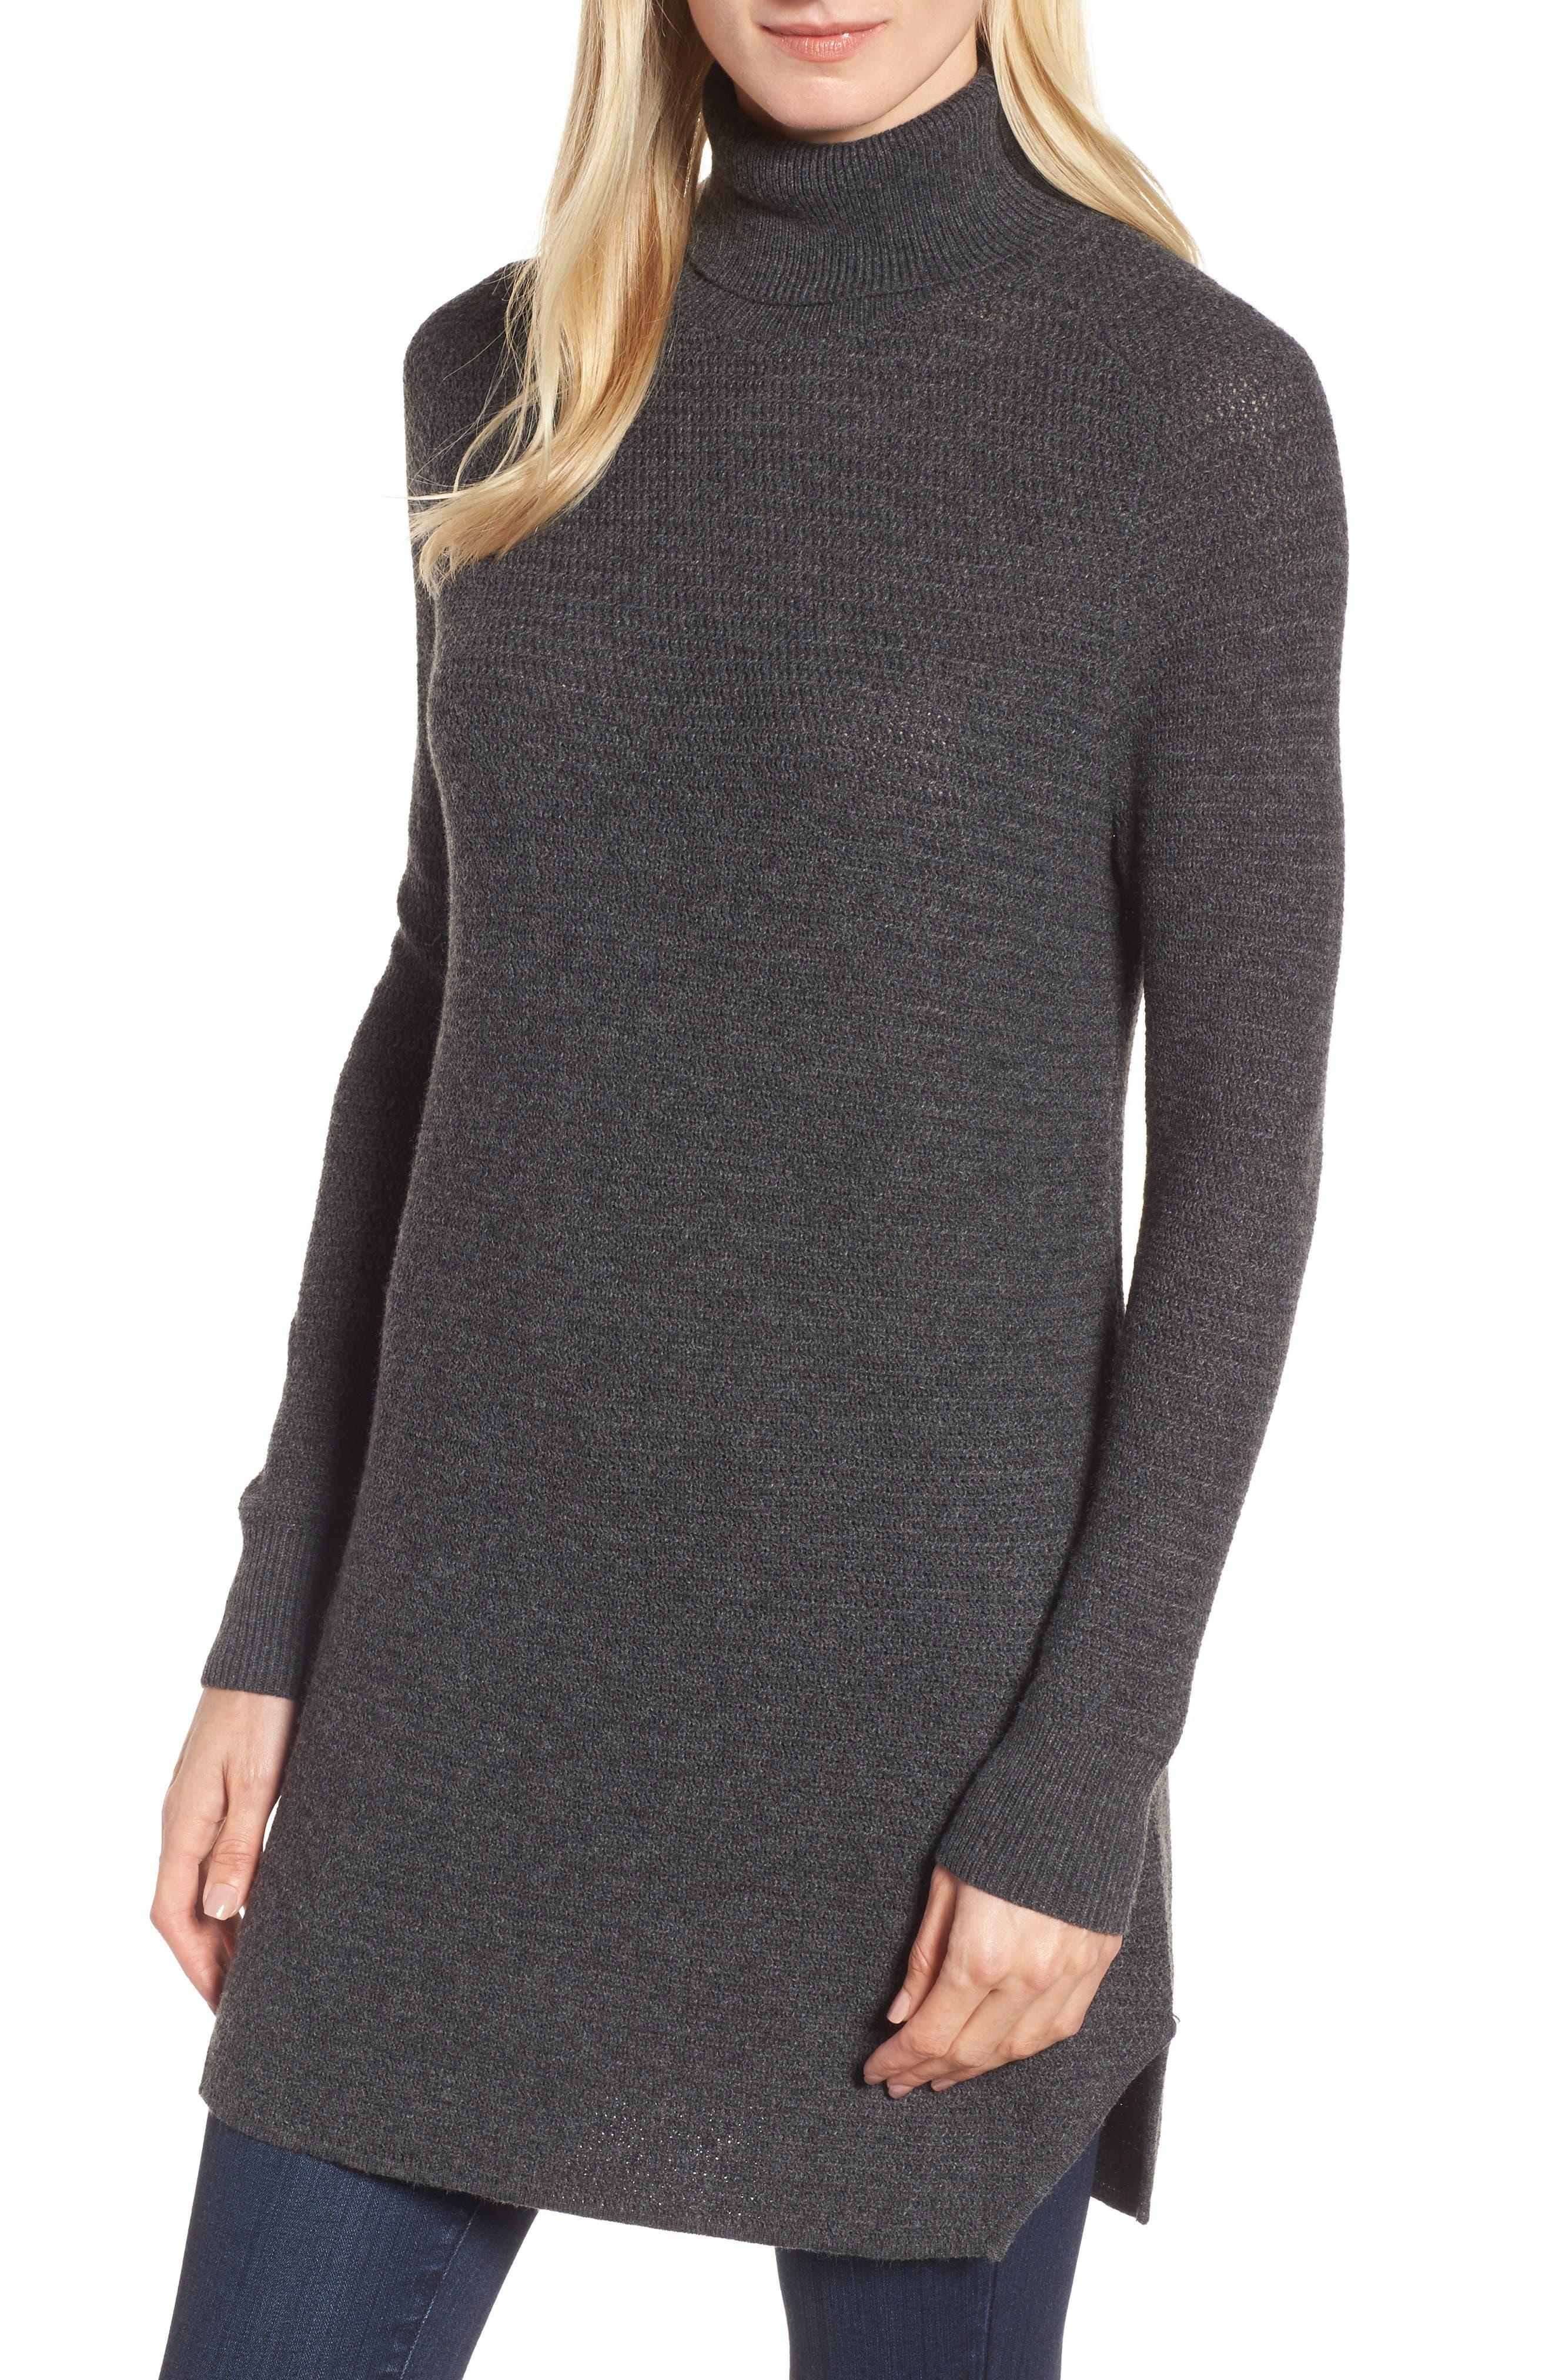 Turtleneck Tunic Sweater,                             Main thumbnail 1, color,                             021